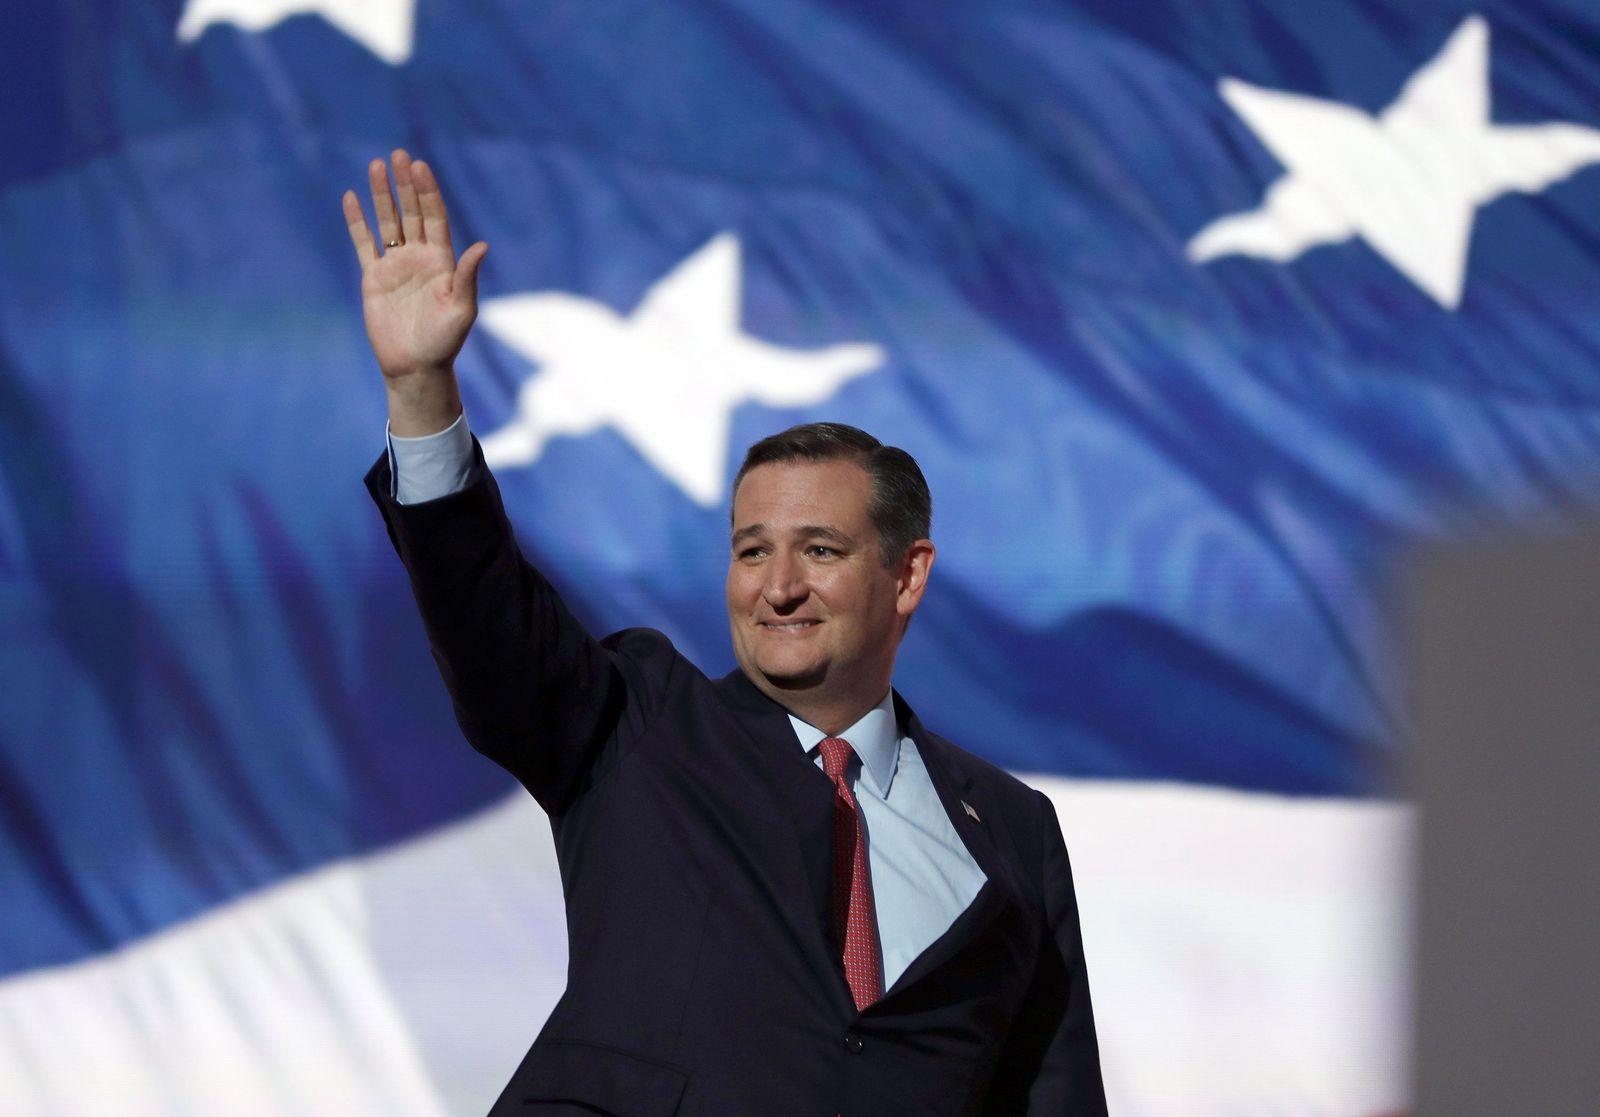 Ted Cruz / GOP